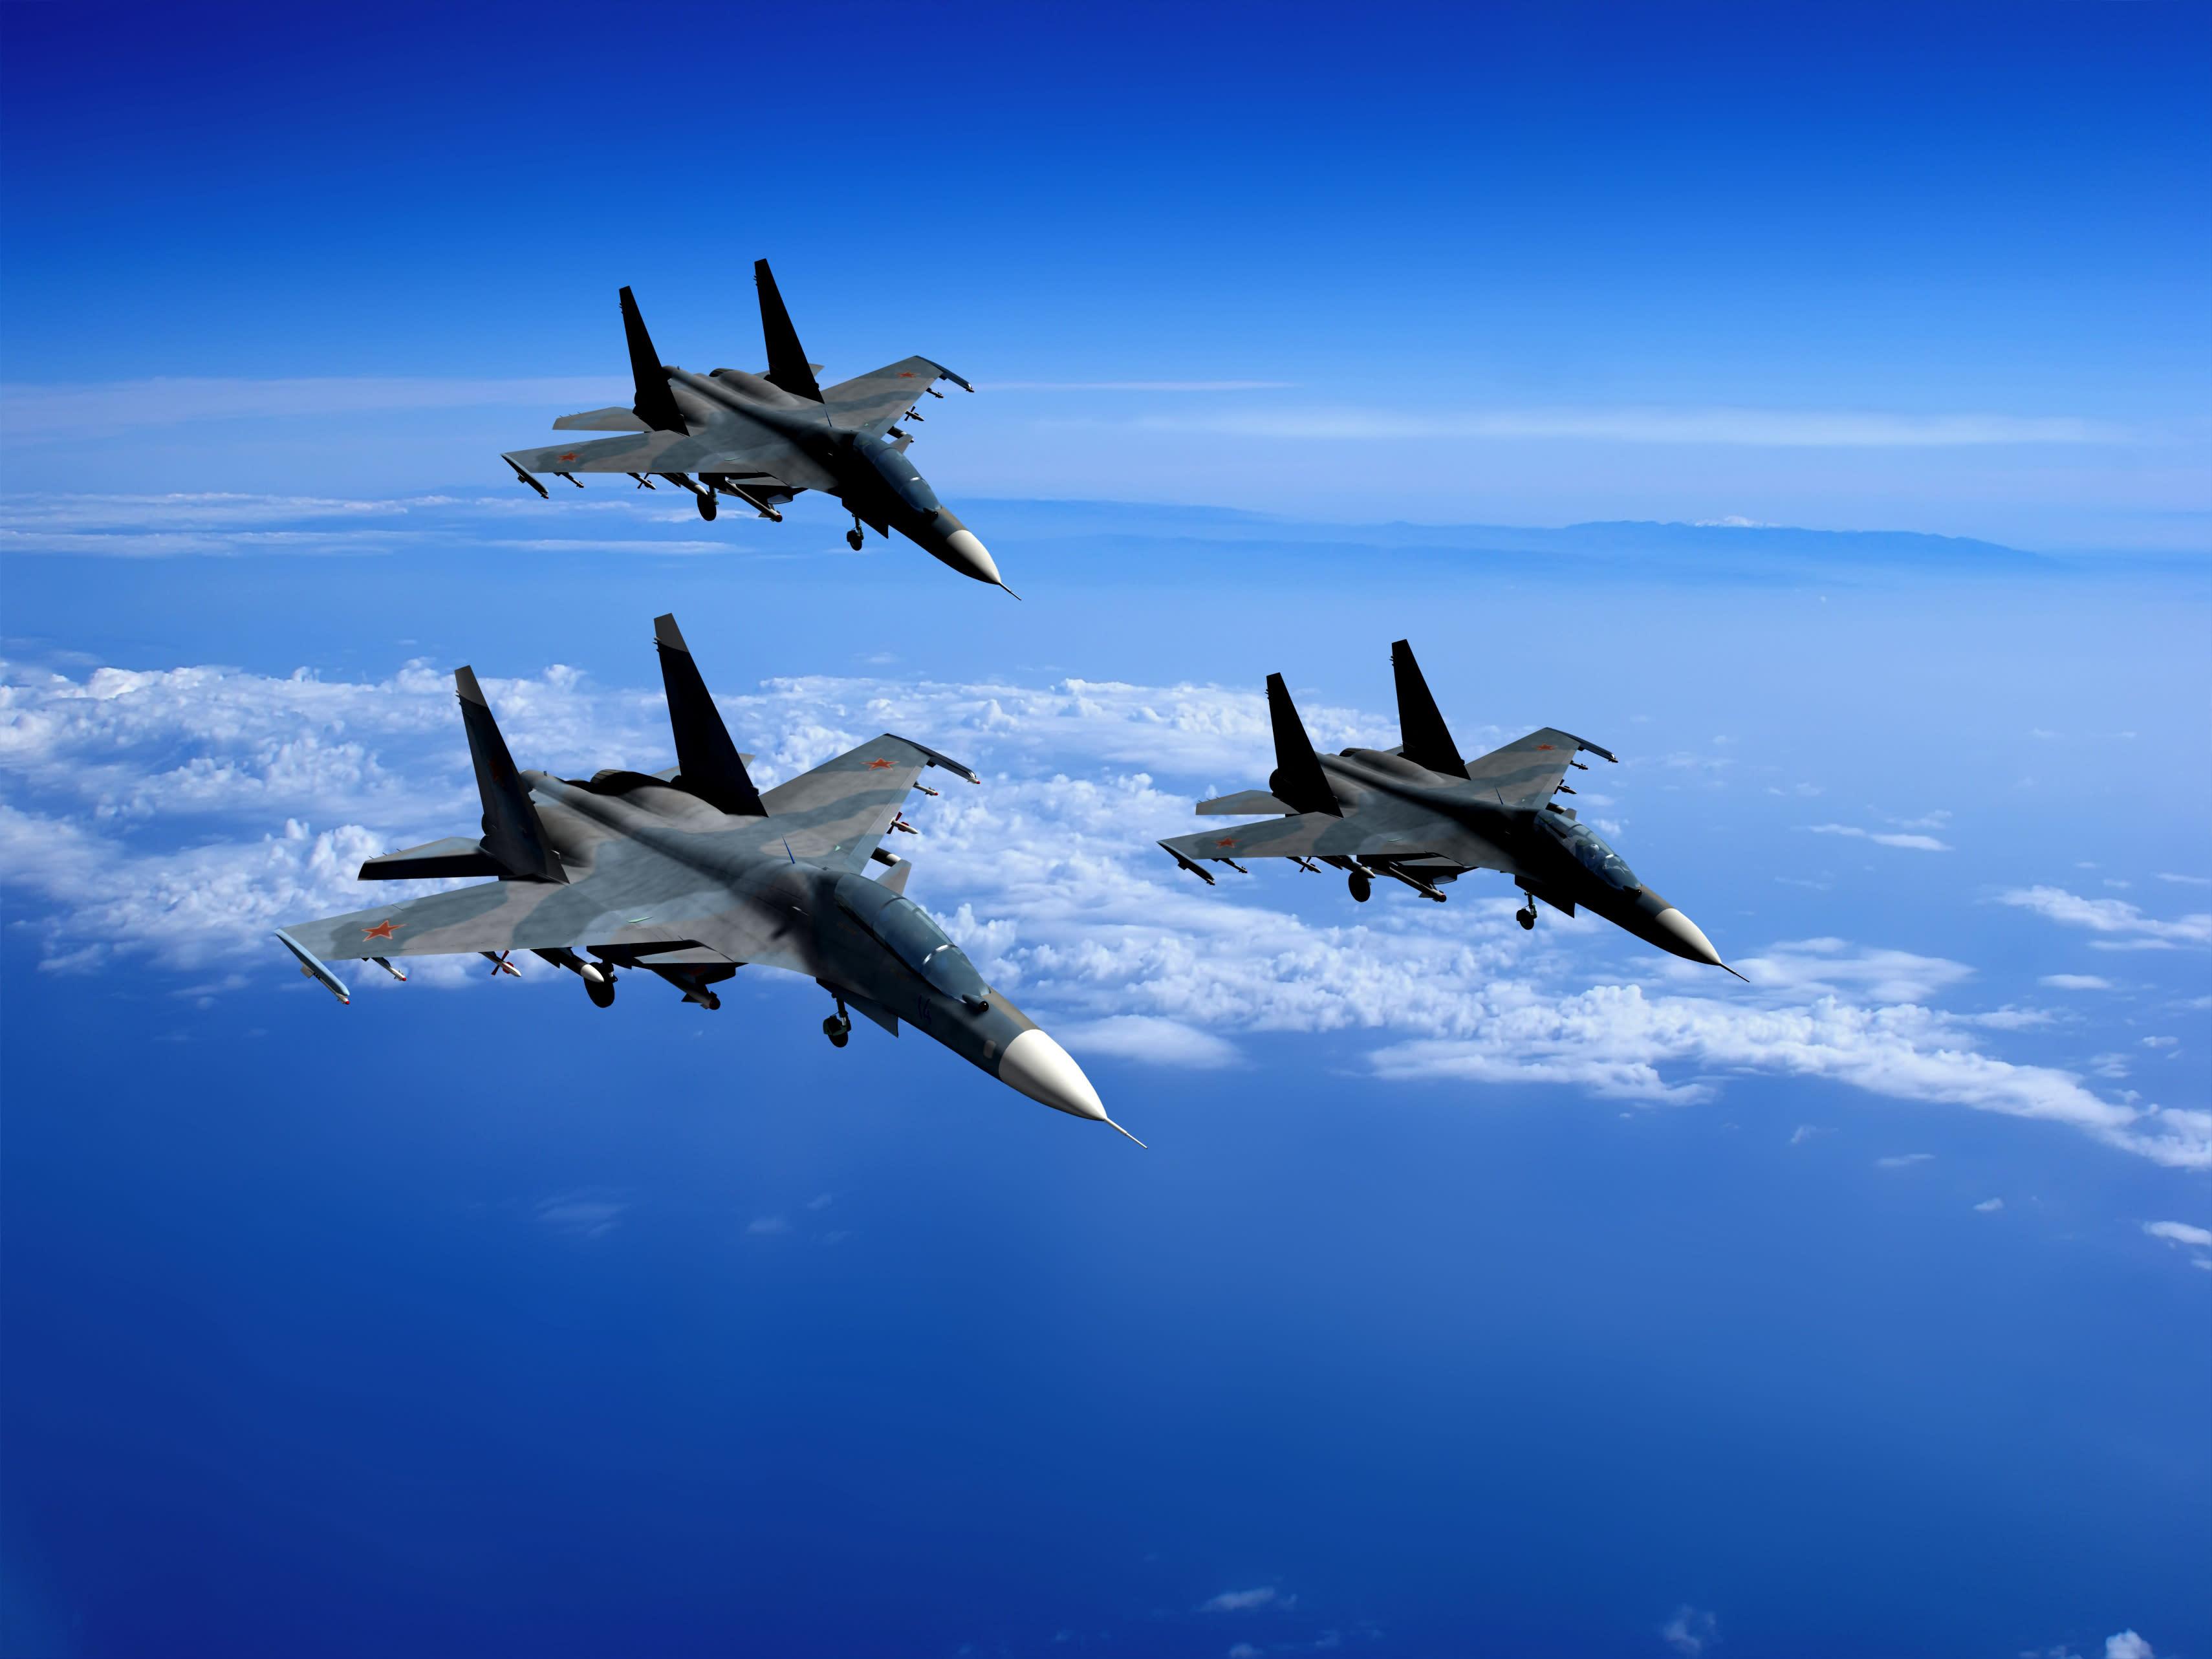 Lockheed Wins $265M Deal to Aid Korea's F-35 Jet Program